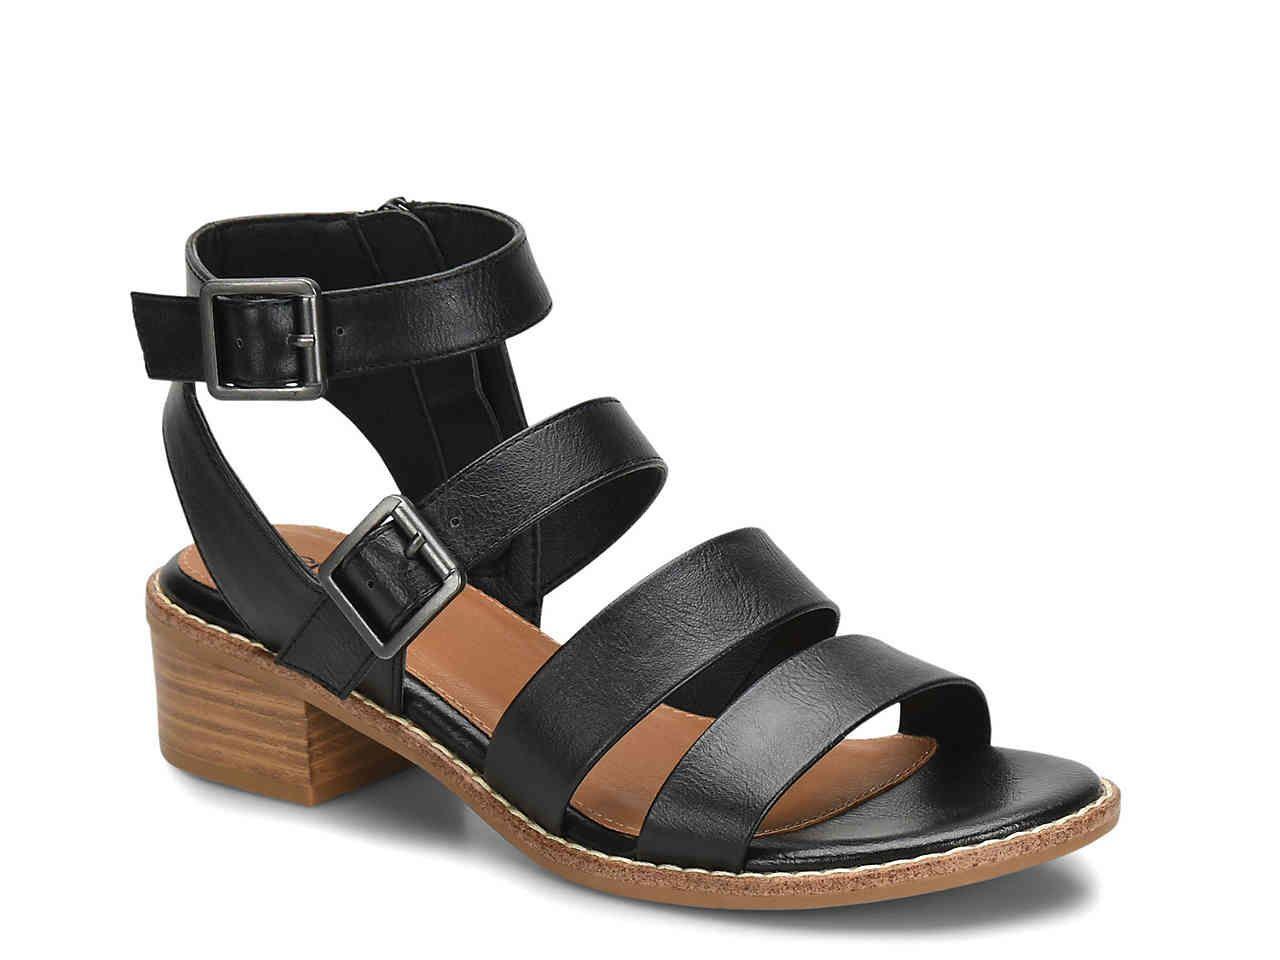 Eurosoft Briar Sandal Women S Shoes Dsw Womens Sandals Sandals Womens Low Heels